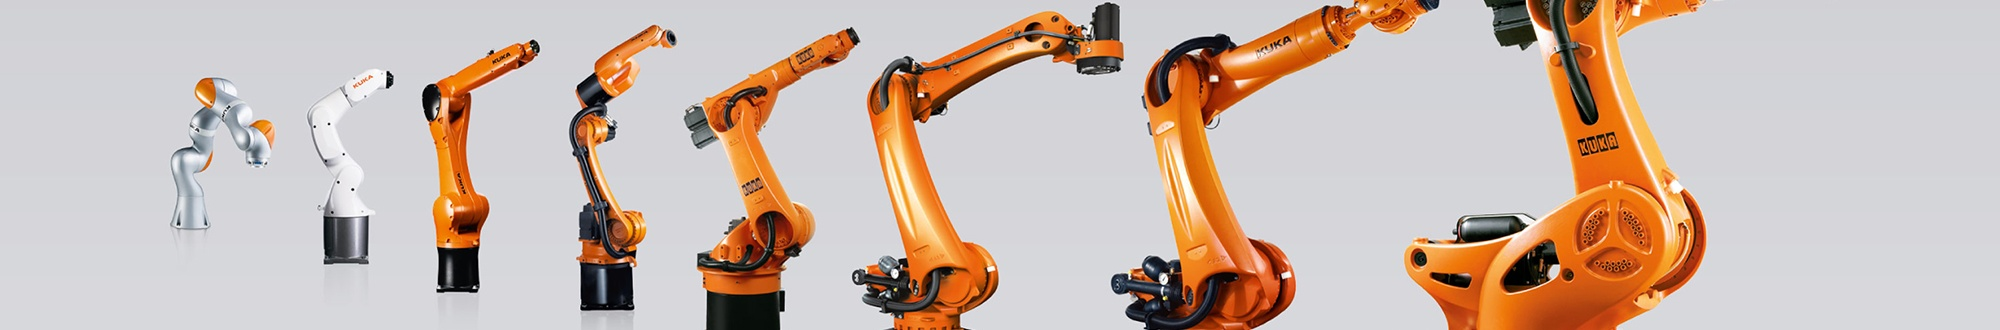 Germany's best - KUKA Industrieroboter-